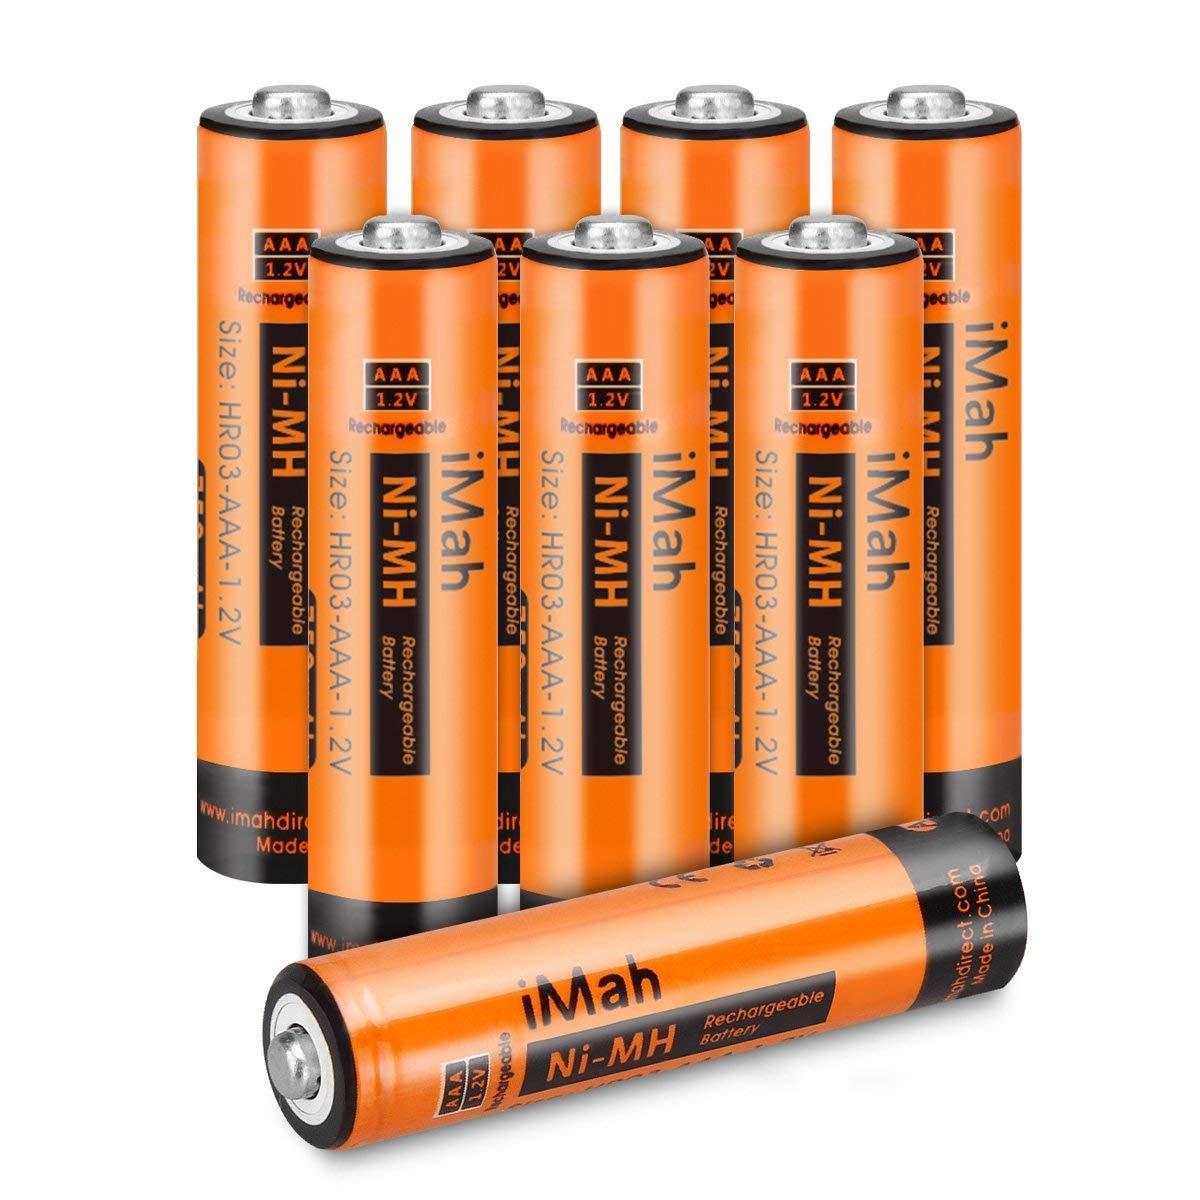 iMah AAA Rechargeable Batteries, Also Compatible with Panasonic Cordless Phone Battery 1.2V 550mAh HHR-55AAABU and 750mAh HHR-75AAA/B, HHR-4DP KX-TGEA40B KX-TGE433B KX-TGE445B KX-TG7875S, Pack of 8